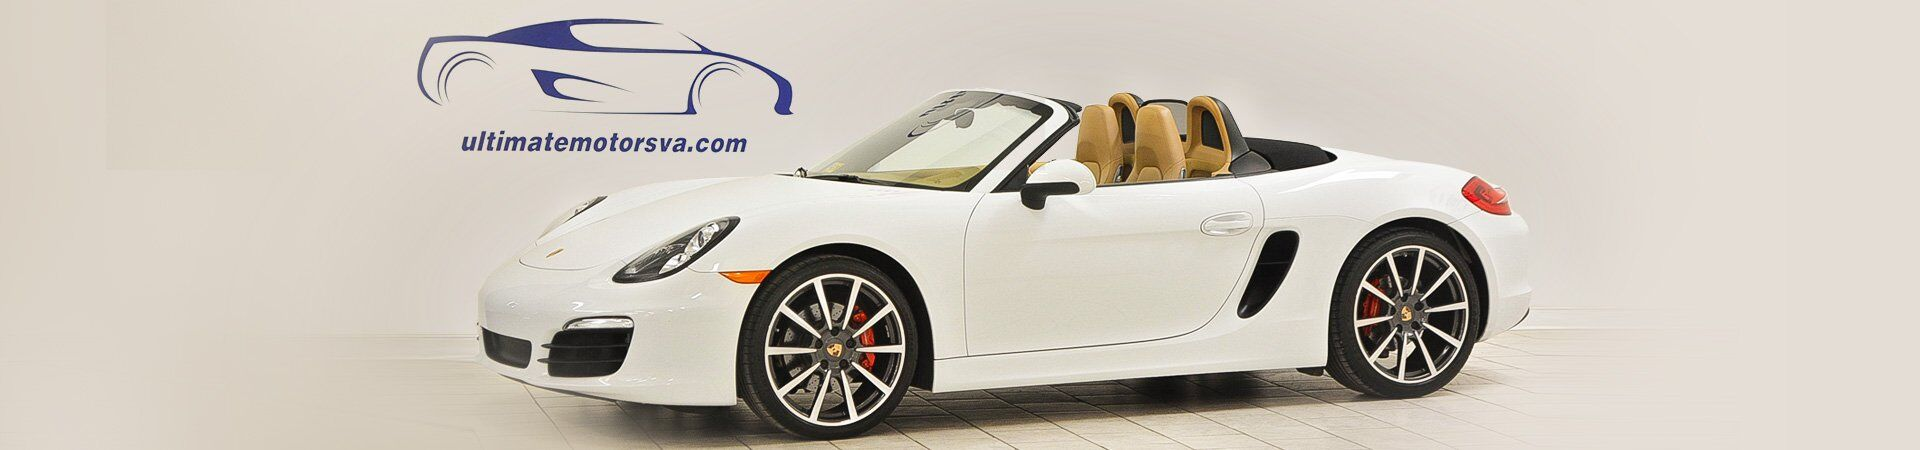 Used car dealership midlothian va ultimate motors for Mercedes benz richmond midlothian va